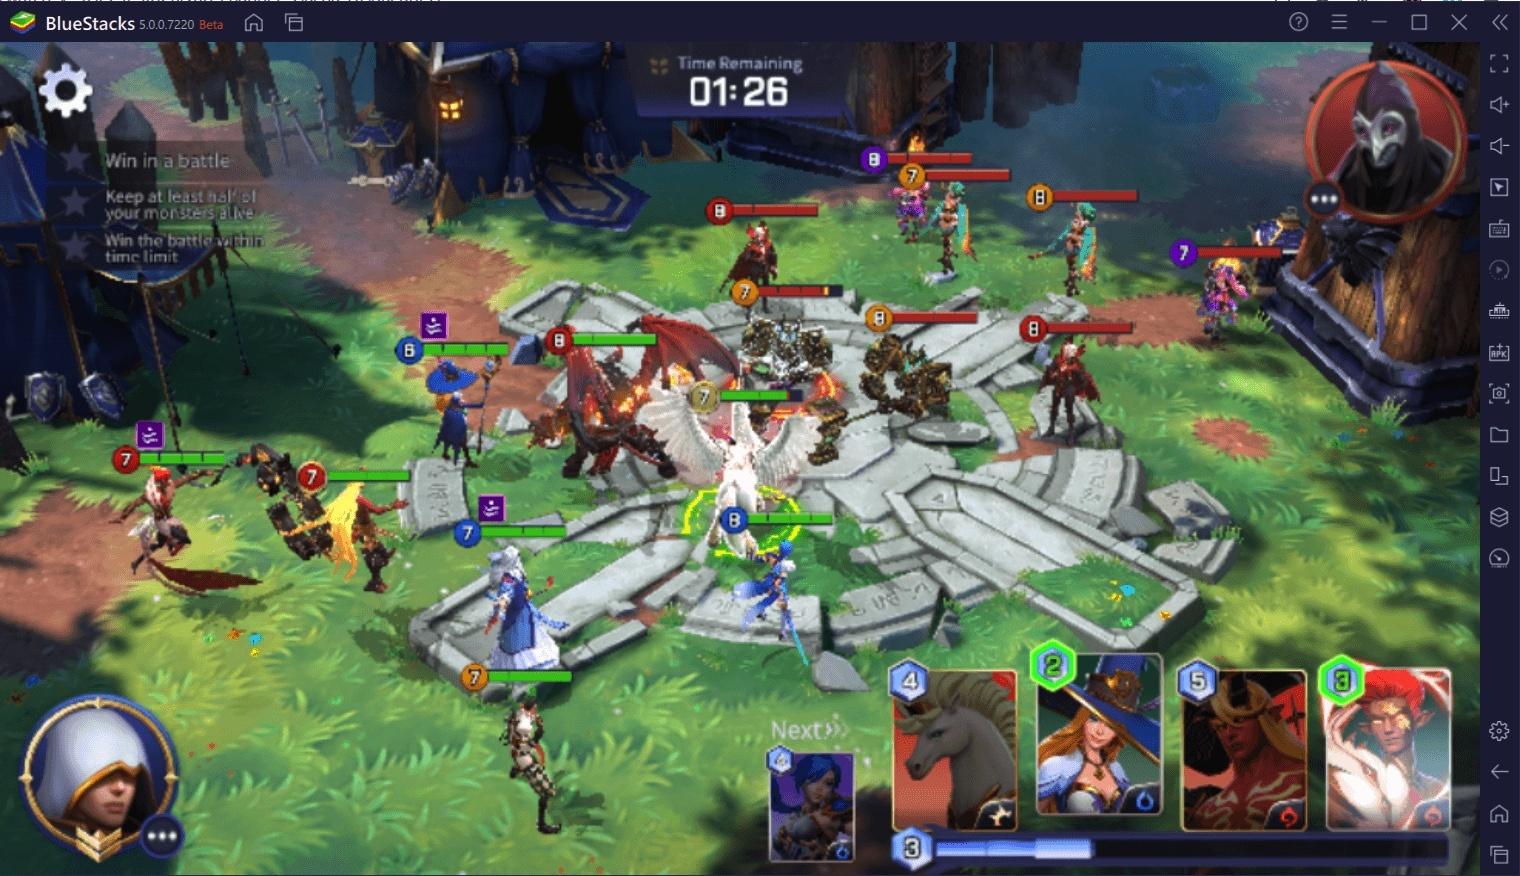 Cùng chơi Summoners War: Lost Centuria trên PC với BlueStacks